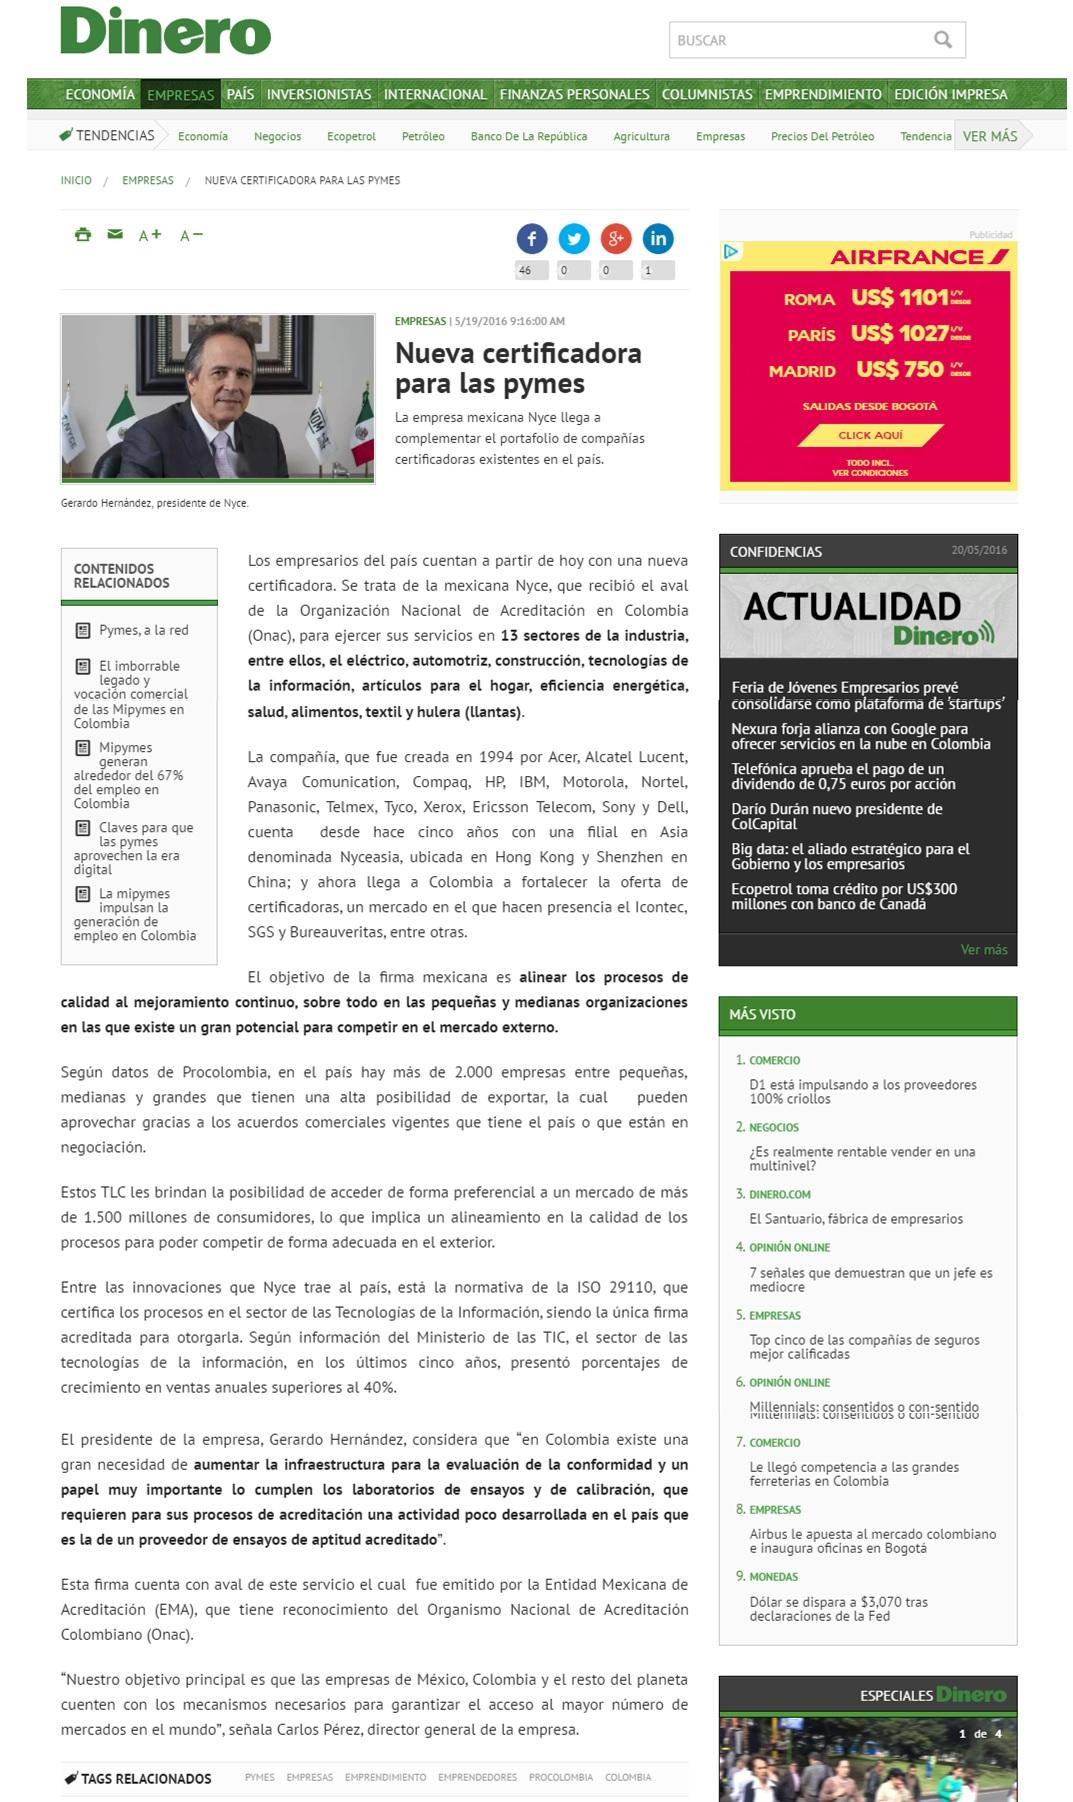 Dinero.com 19 de Mayo de 2016